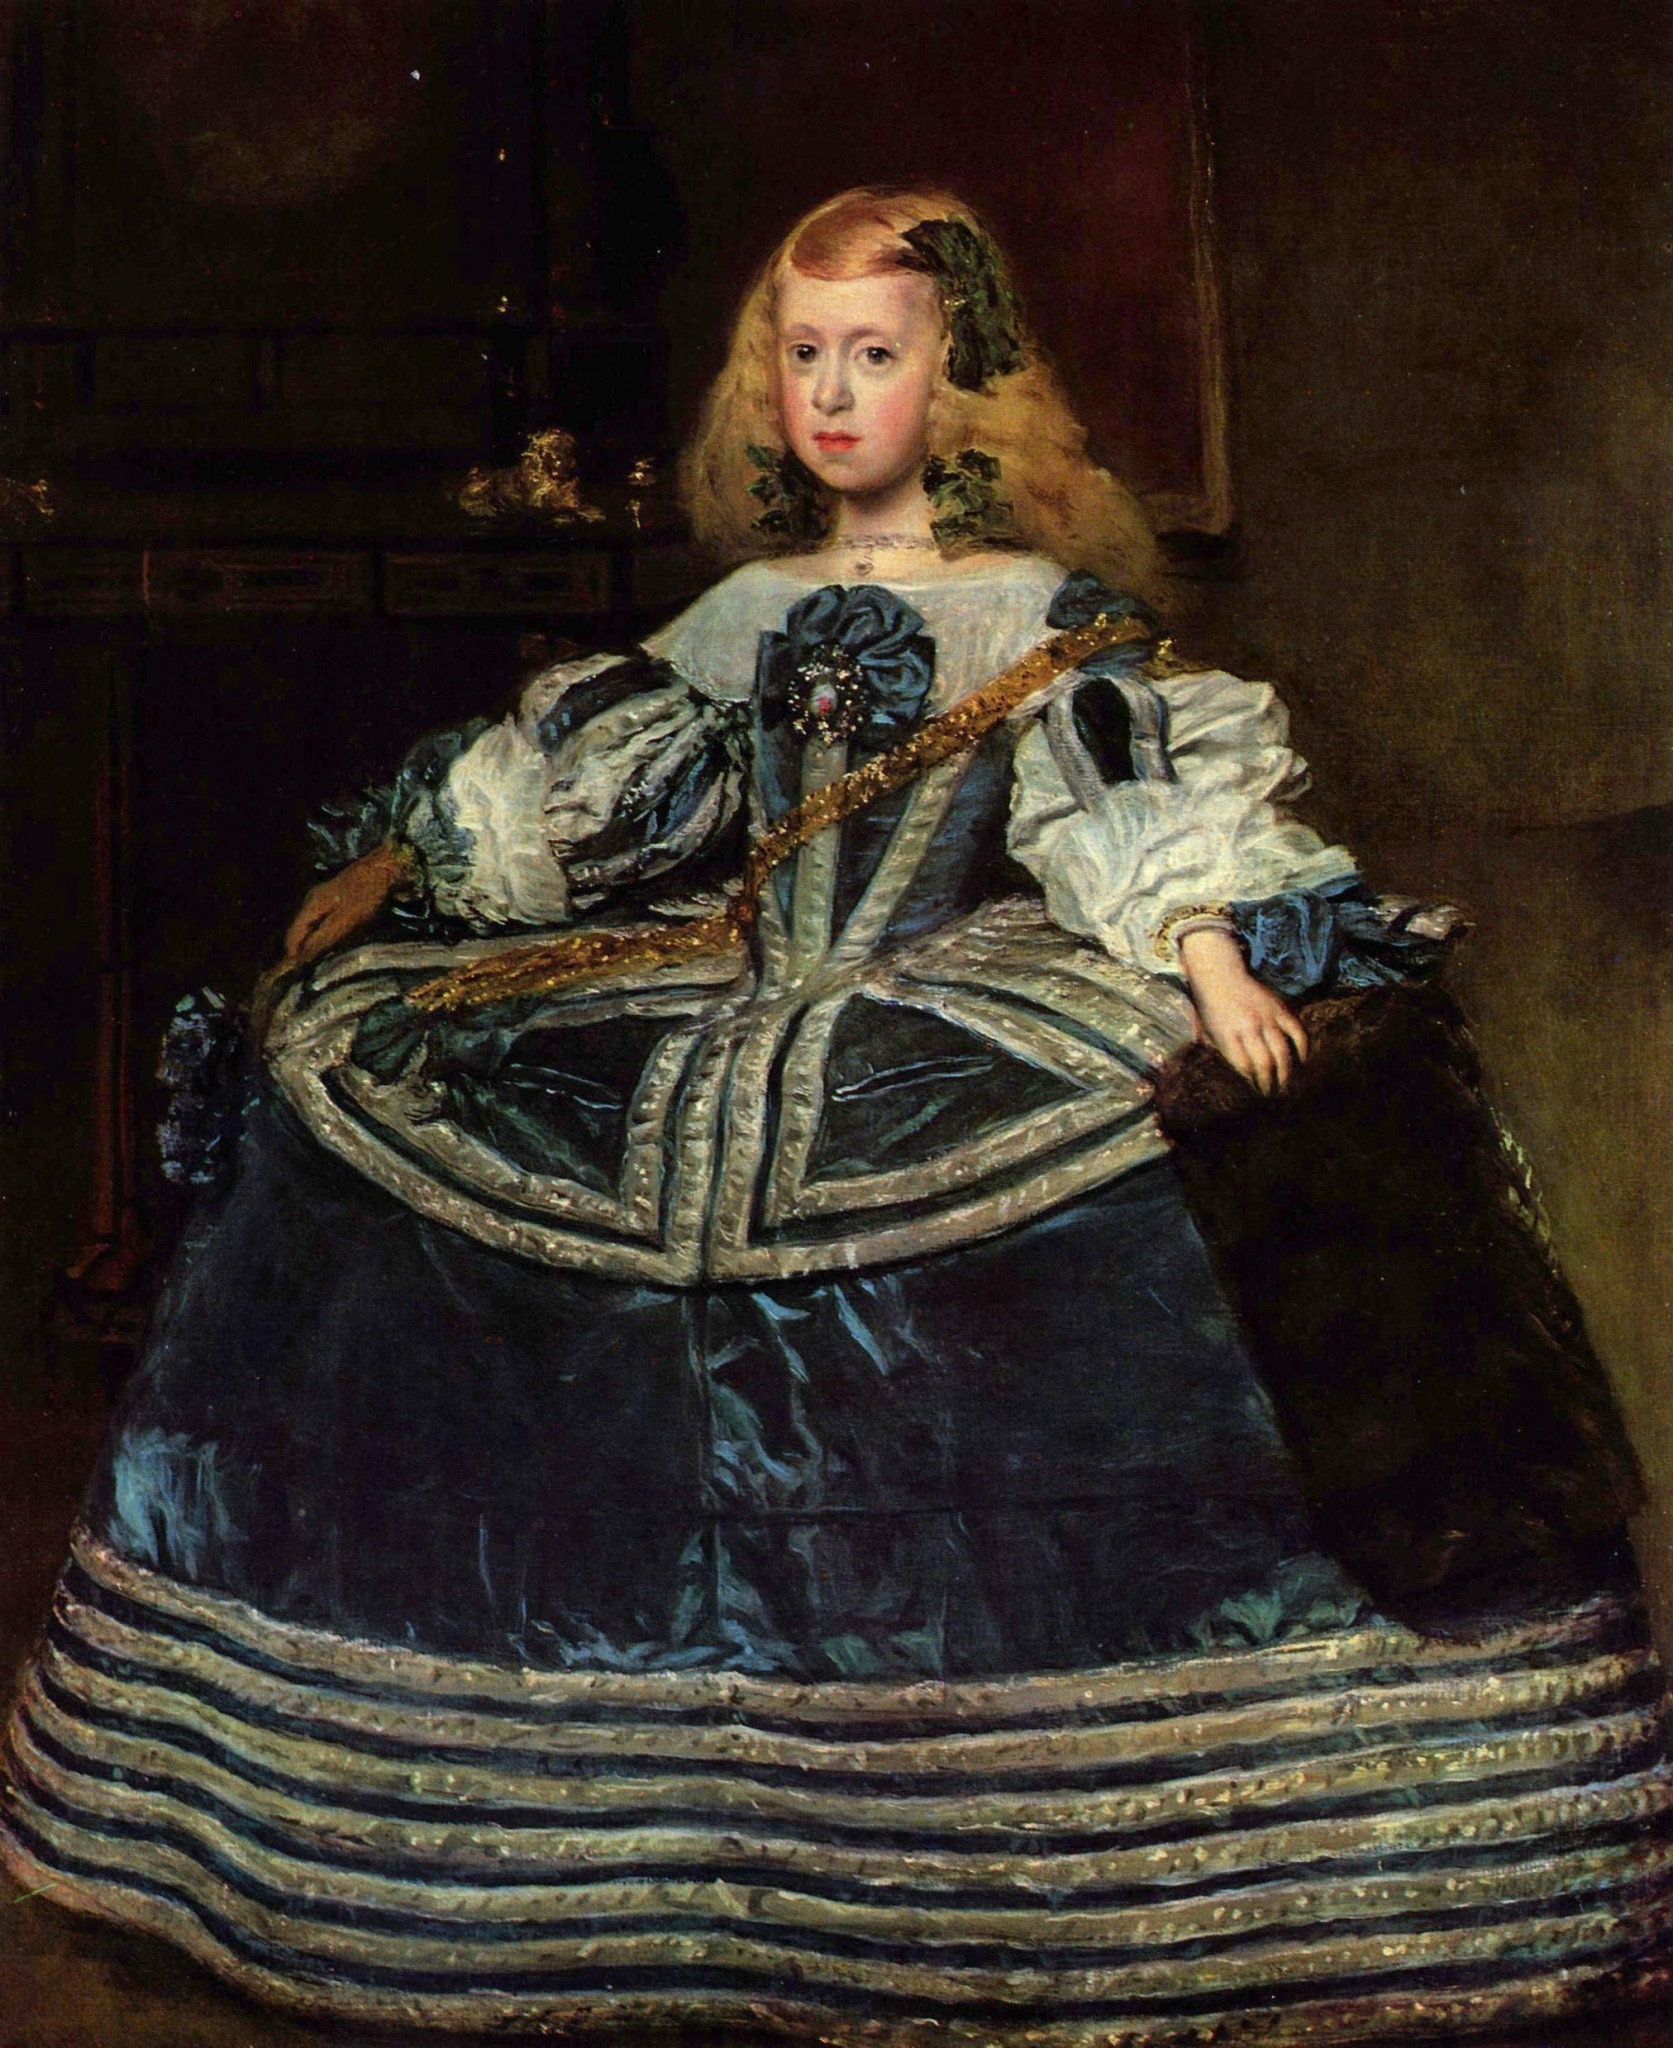 Diego Velázquez (Portrait of the Infanta Margarita. 1660)